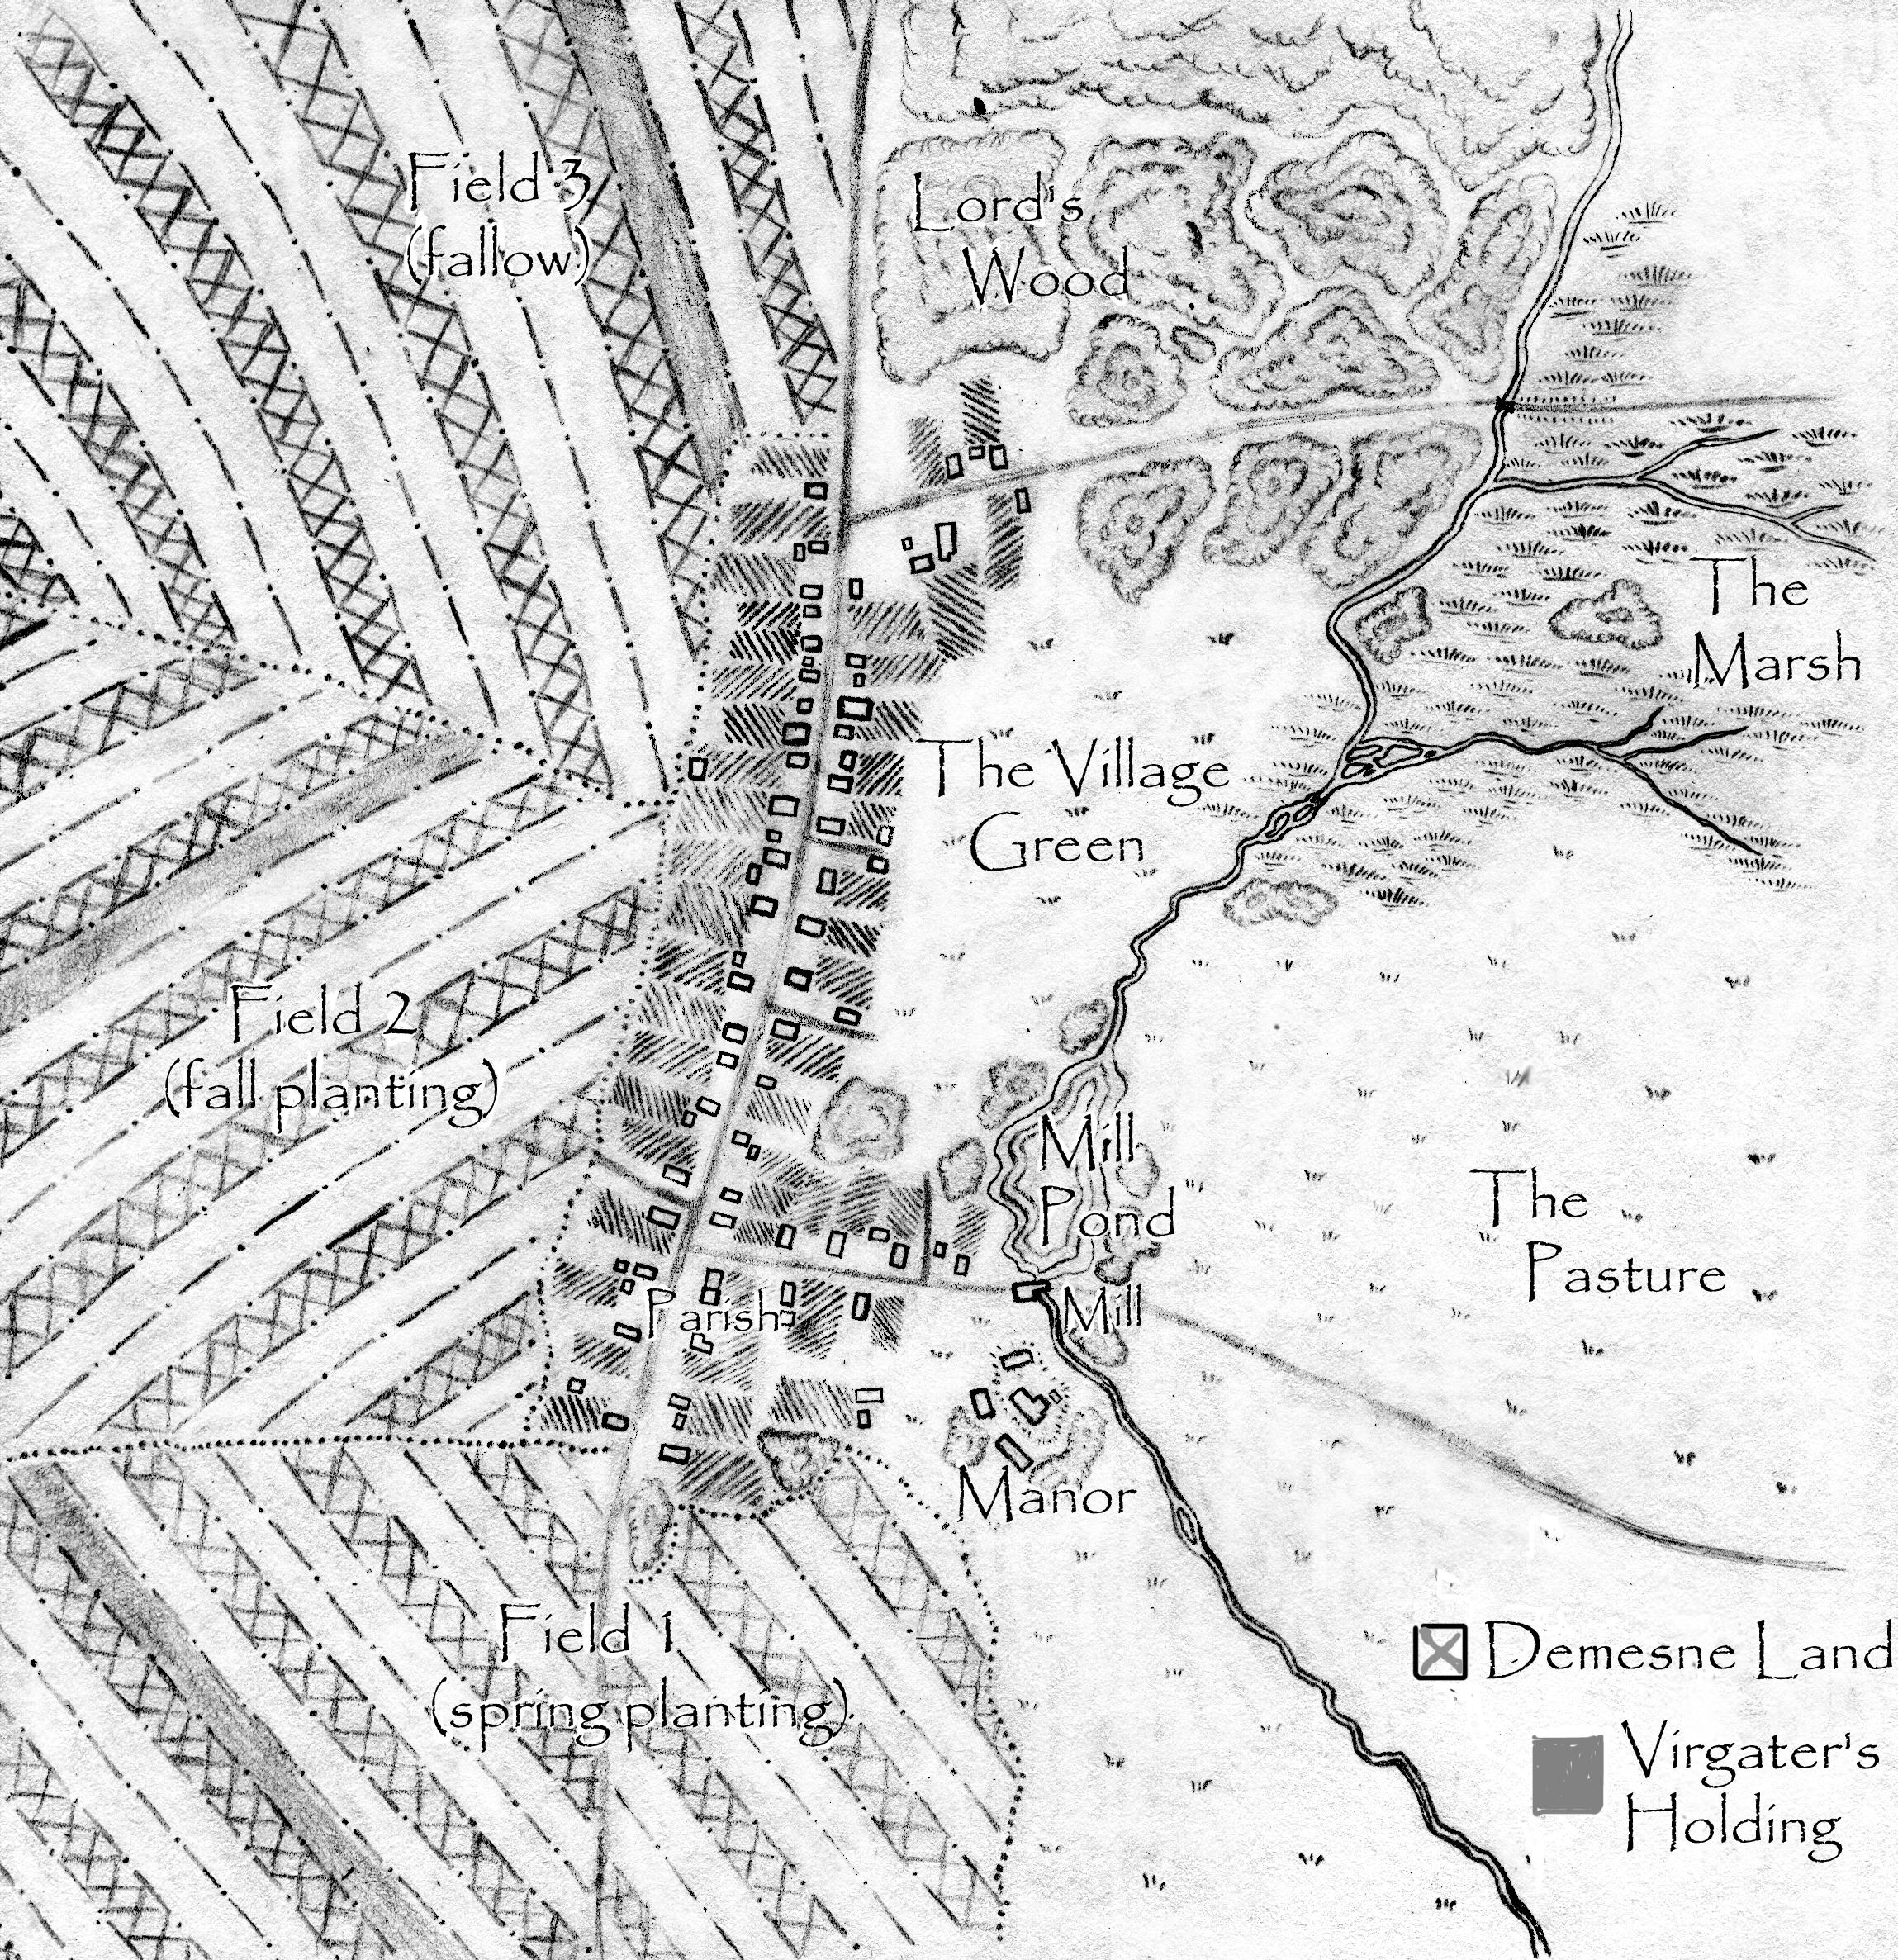 Duncarron Medieval Village